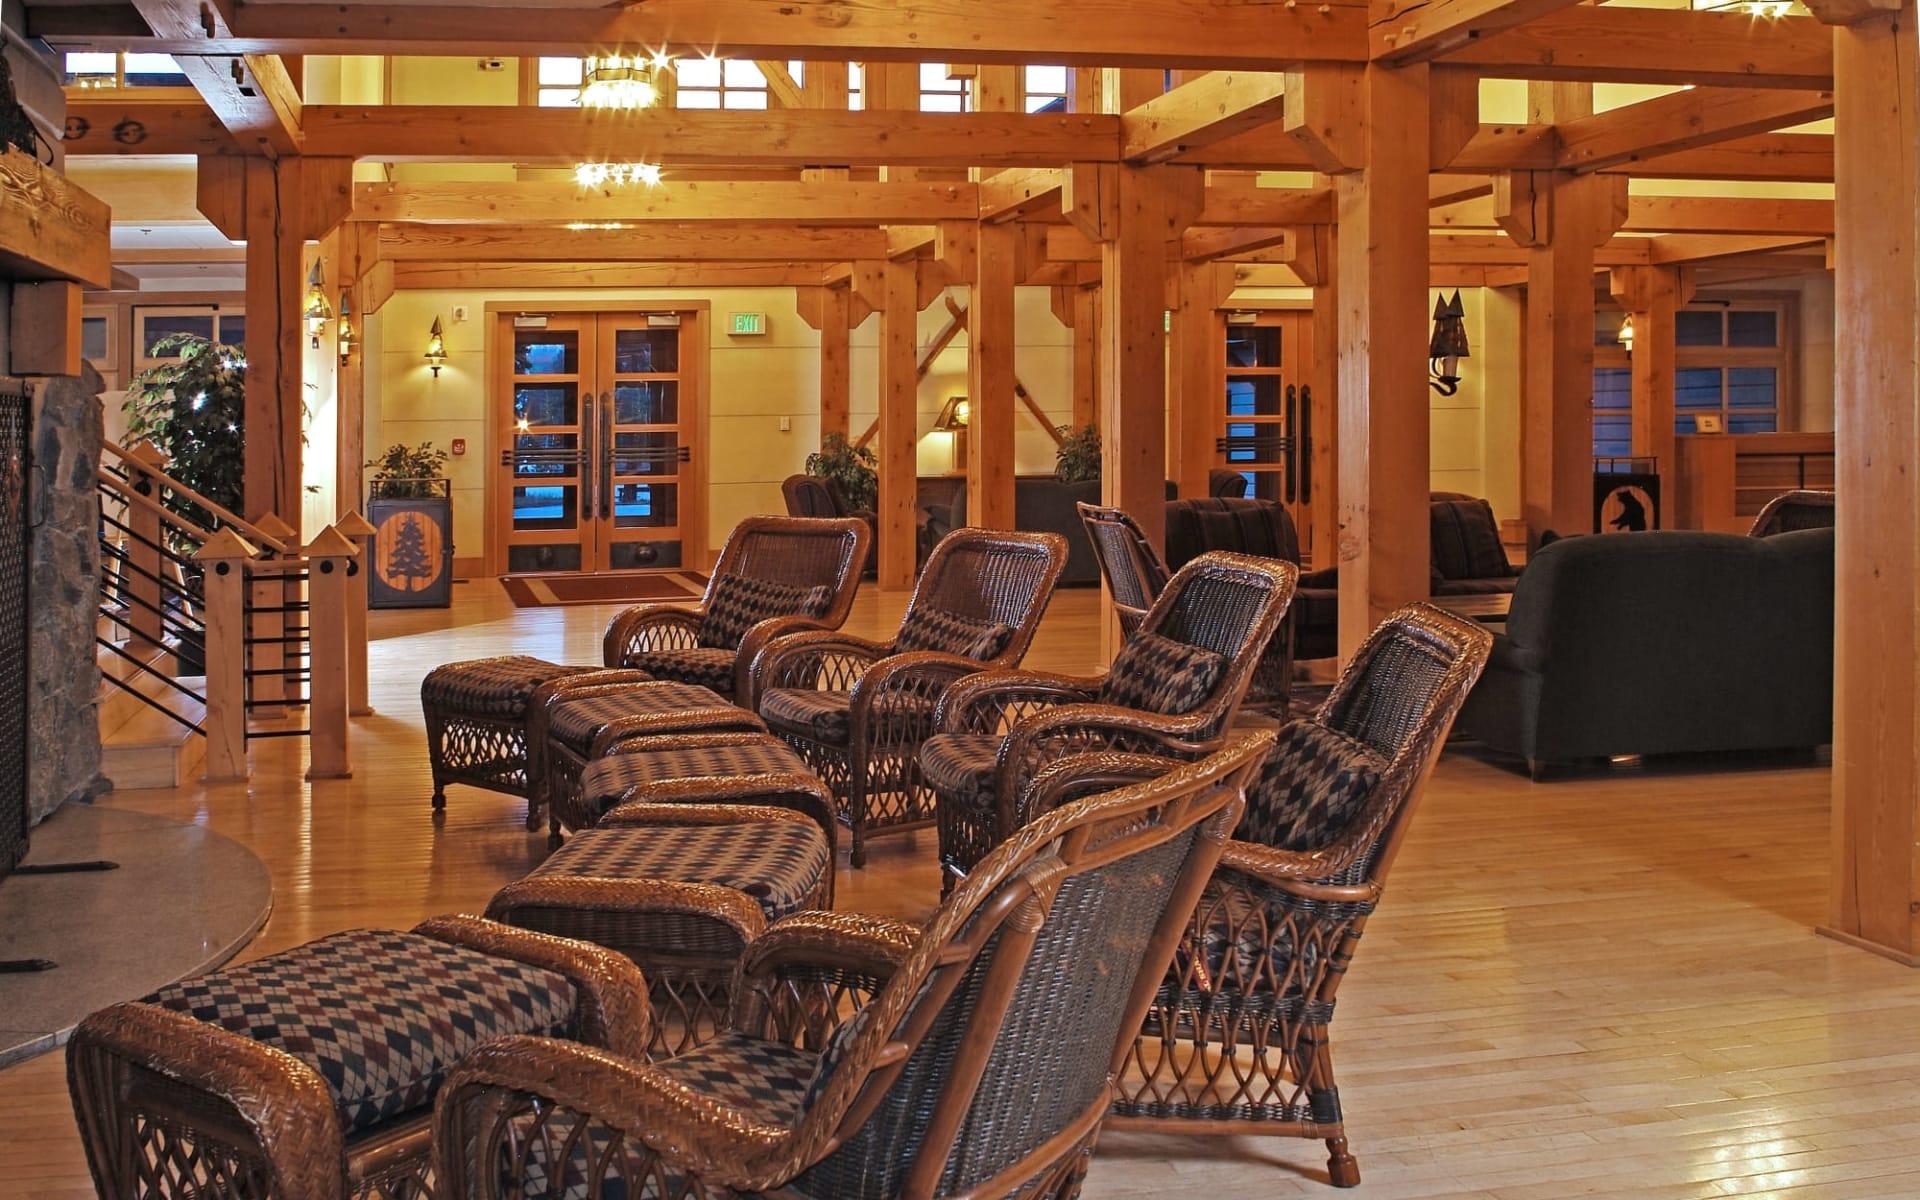 Old Faithful Snow Lodge in Yellowstone National Park: Old Faithful Snow Lodge - Hotel Lobby